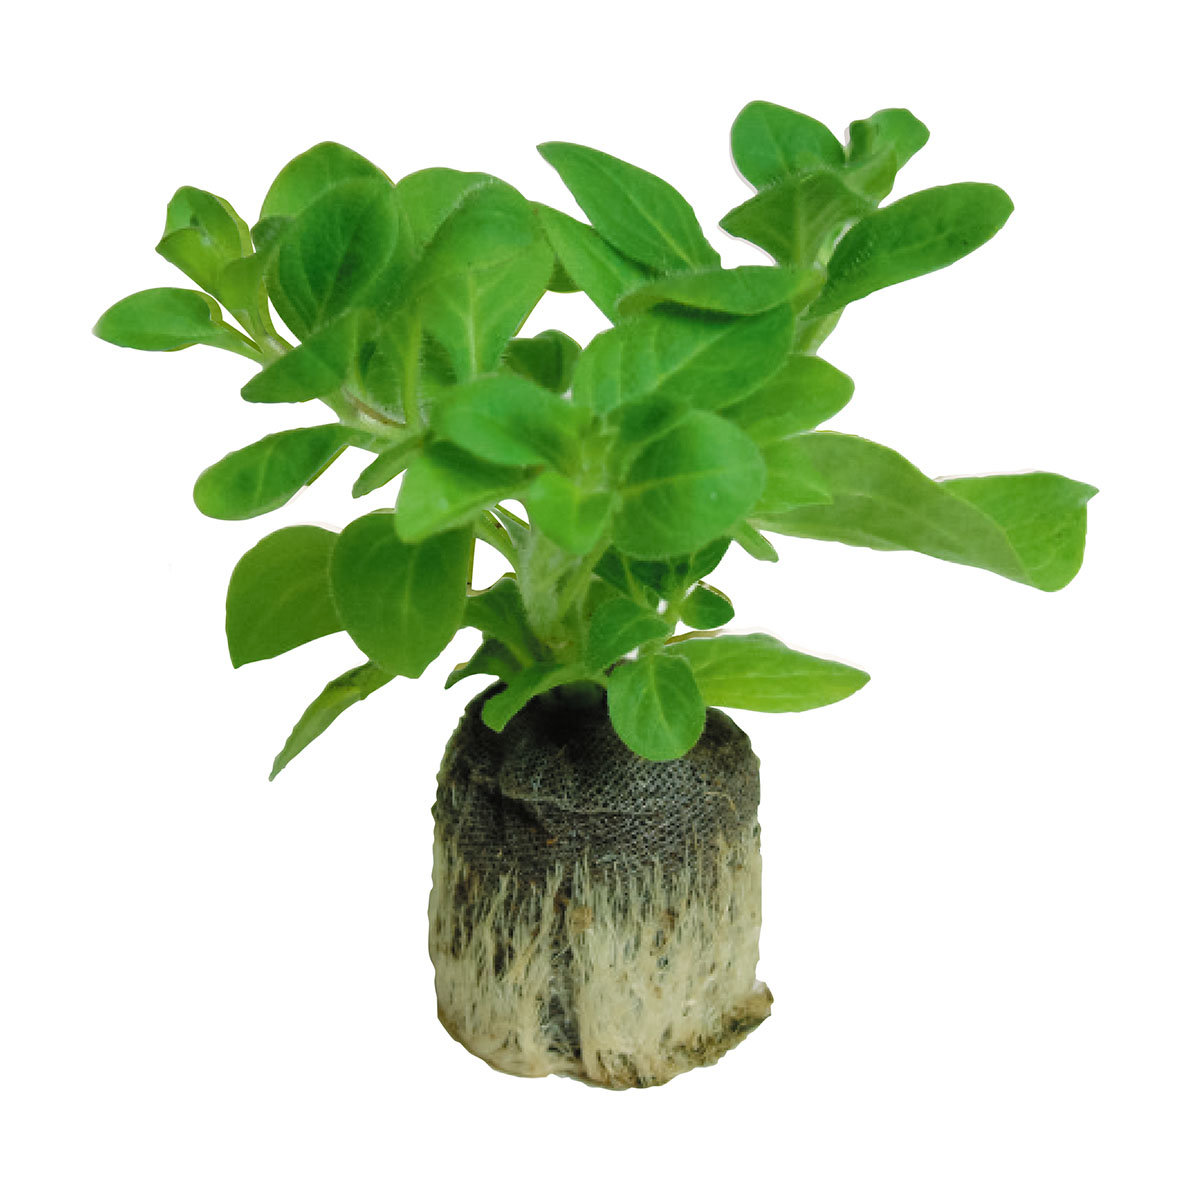 Mini-Jungpflanzen Calibrachoa-Petunien Carnival-Mischung | #3